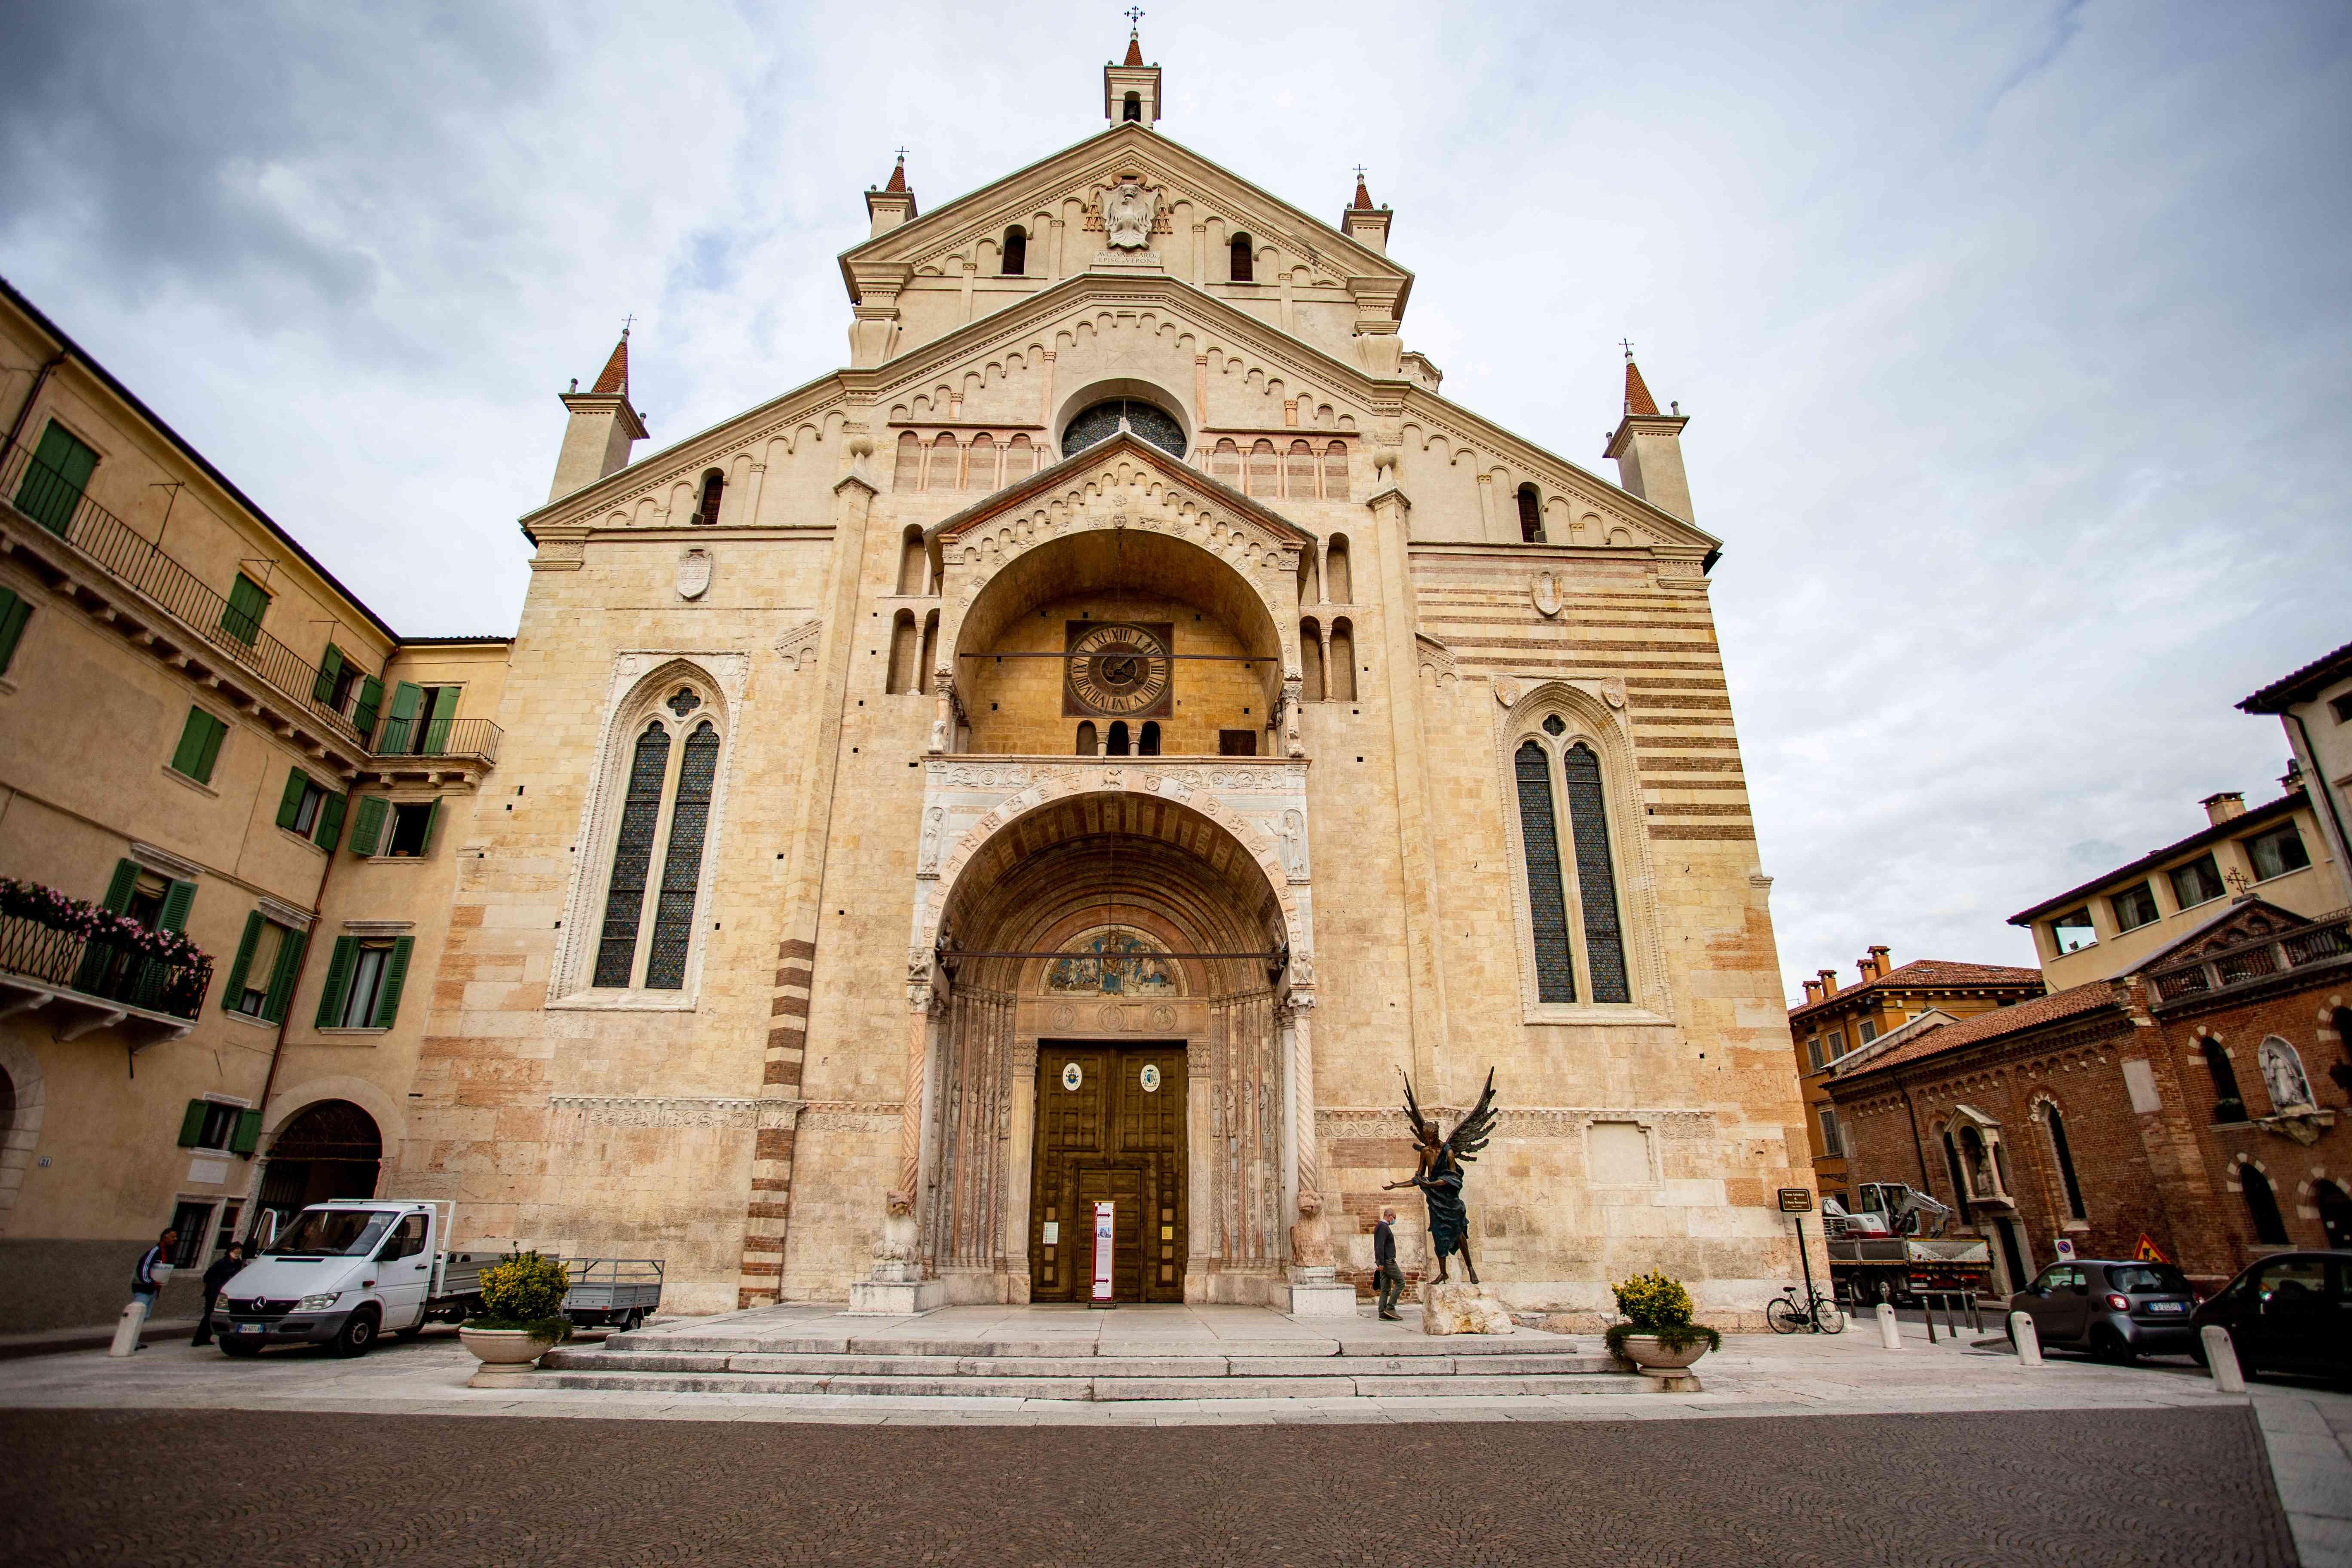 Duomo di Verona in Italy